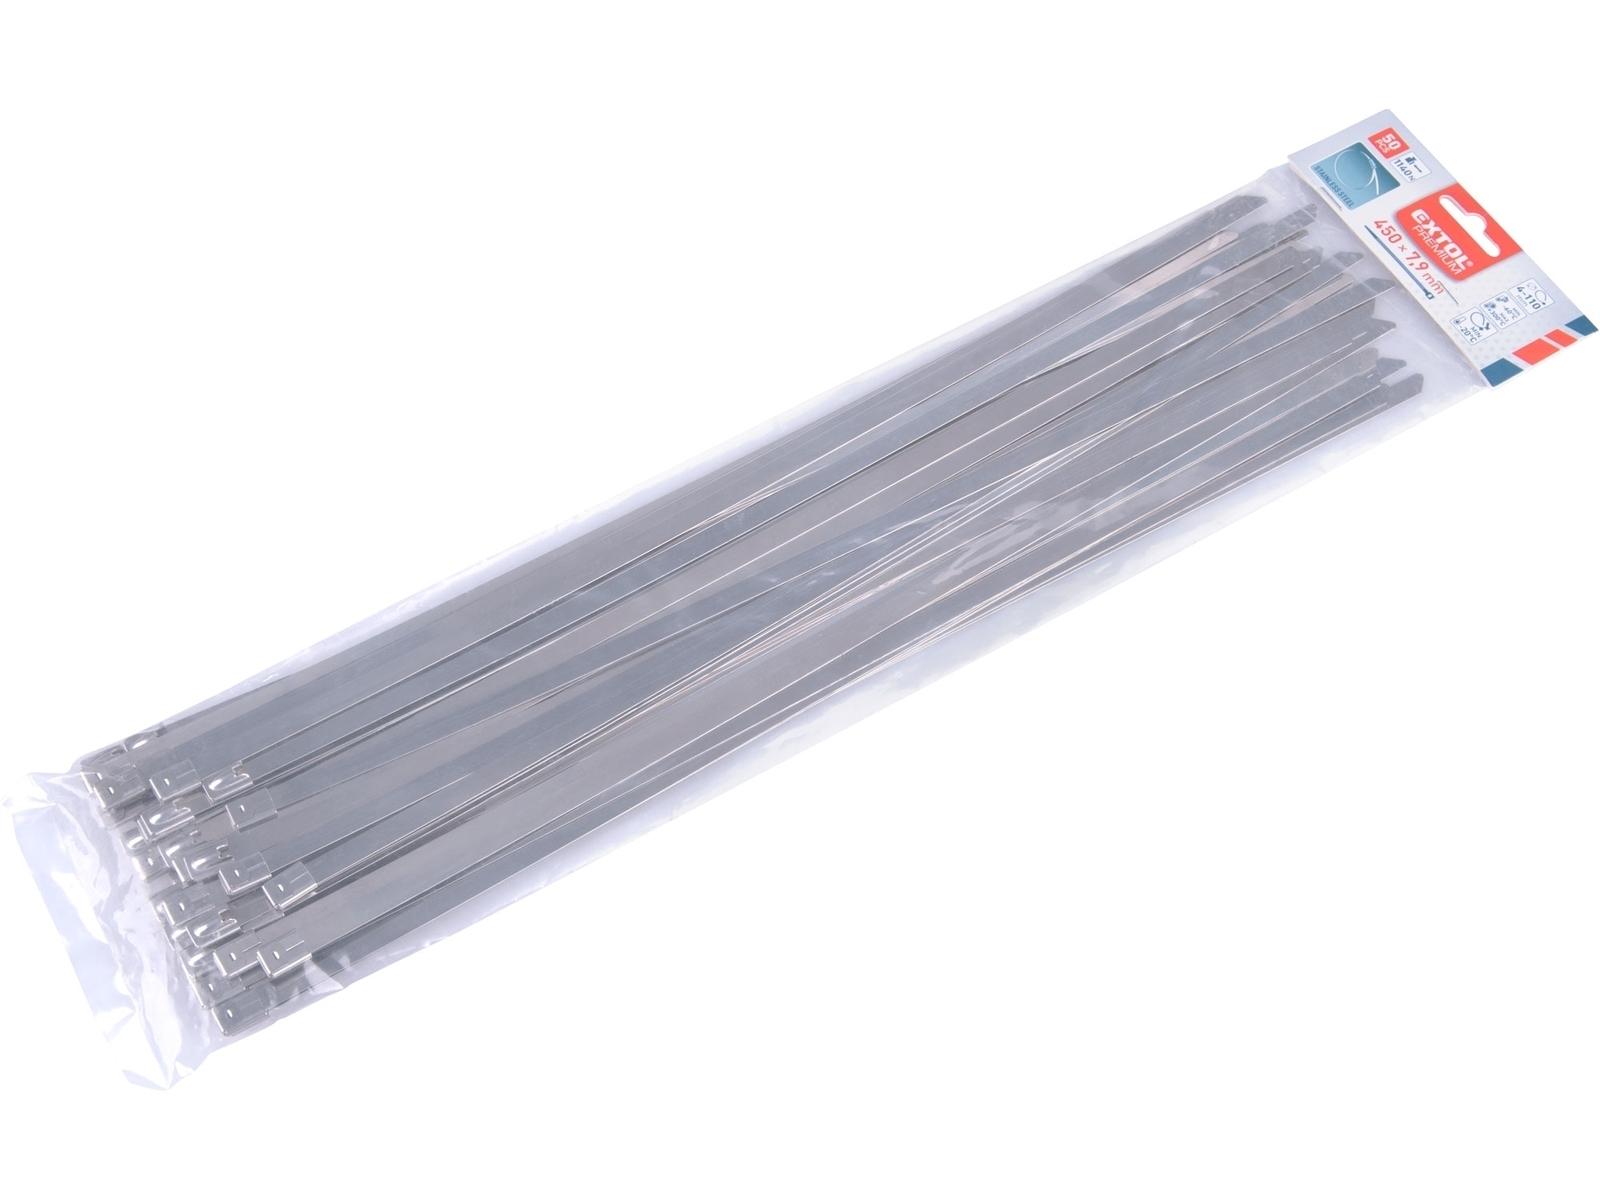 Stahovací pásky 450 x 7,9 mm nerezové, sada 50 ks - EXTOL PREMIUM EX8856282